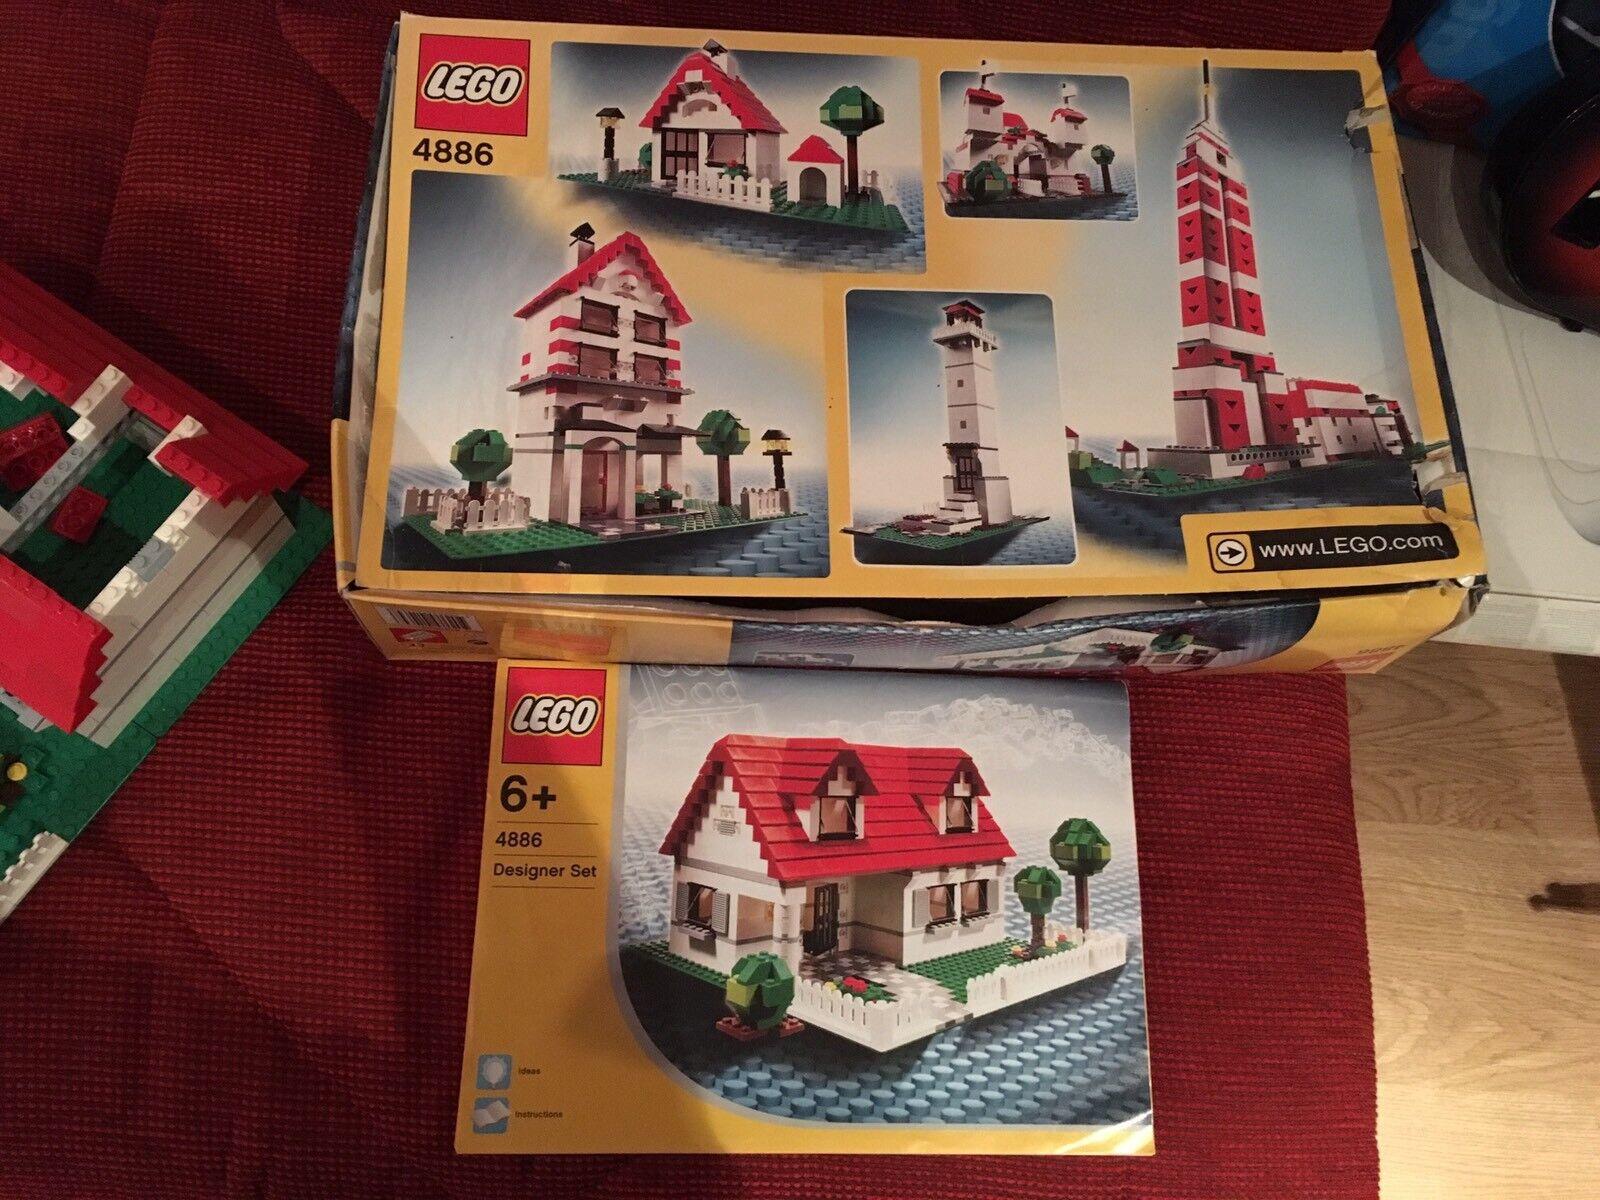 Lego 4886 Designer Set